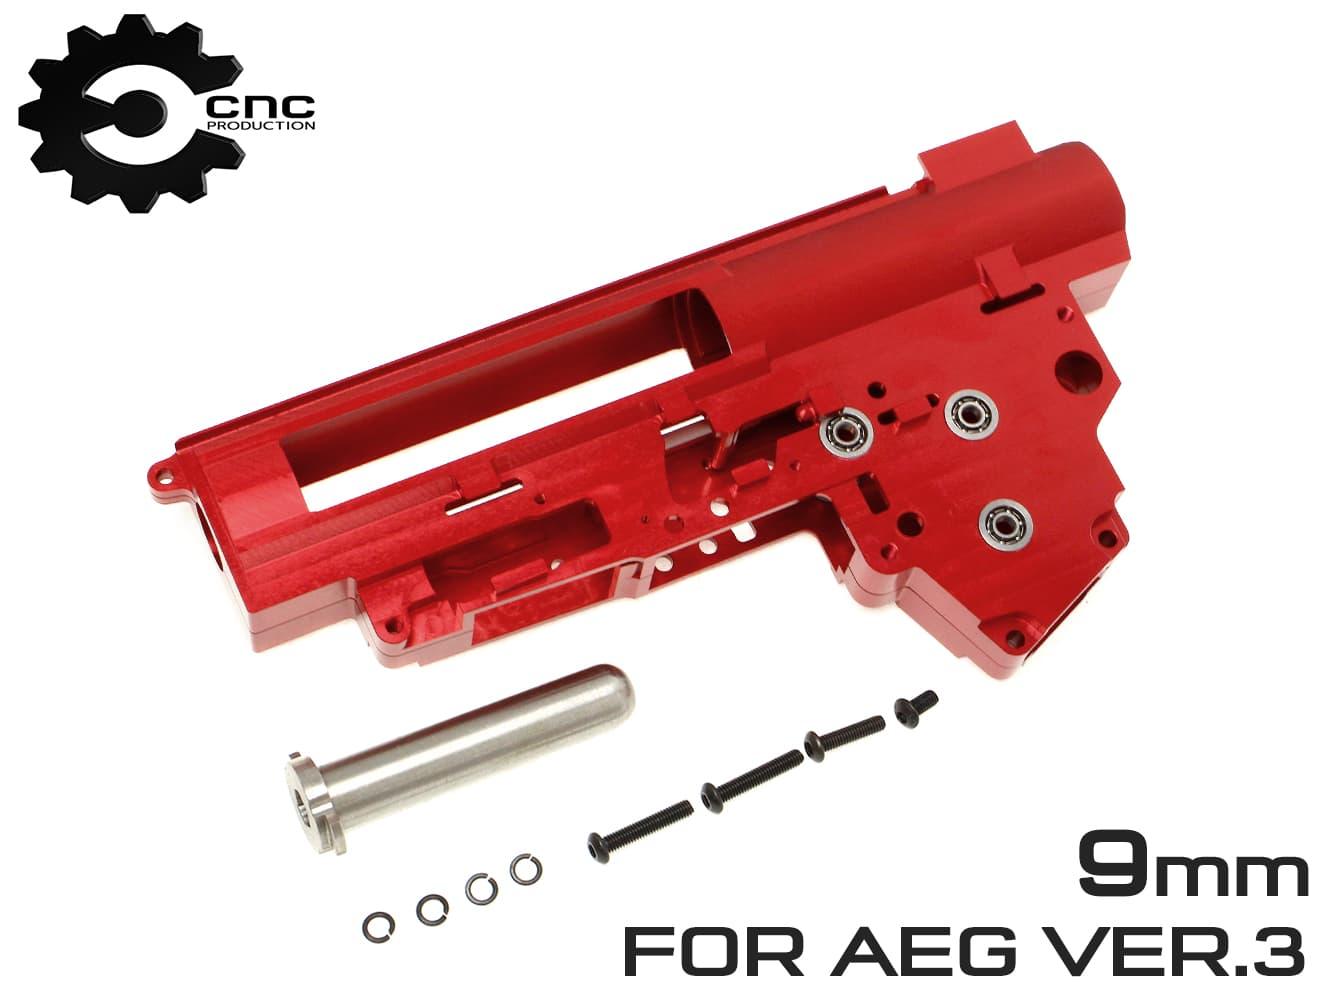 CNC Production A6063 CNC QDメカボックス 9mm Ver3◆各社電動ガン Ver3 メカボックス対応 9ミリ ベアリング内蔵 高強度アルミ合金